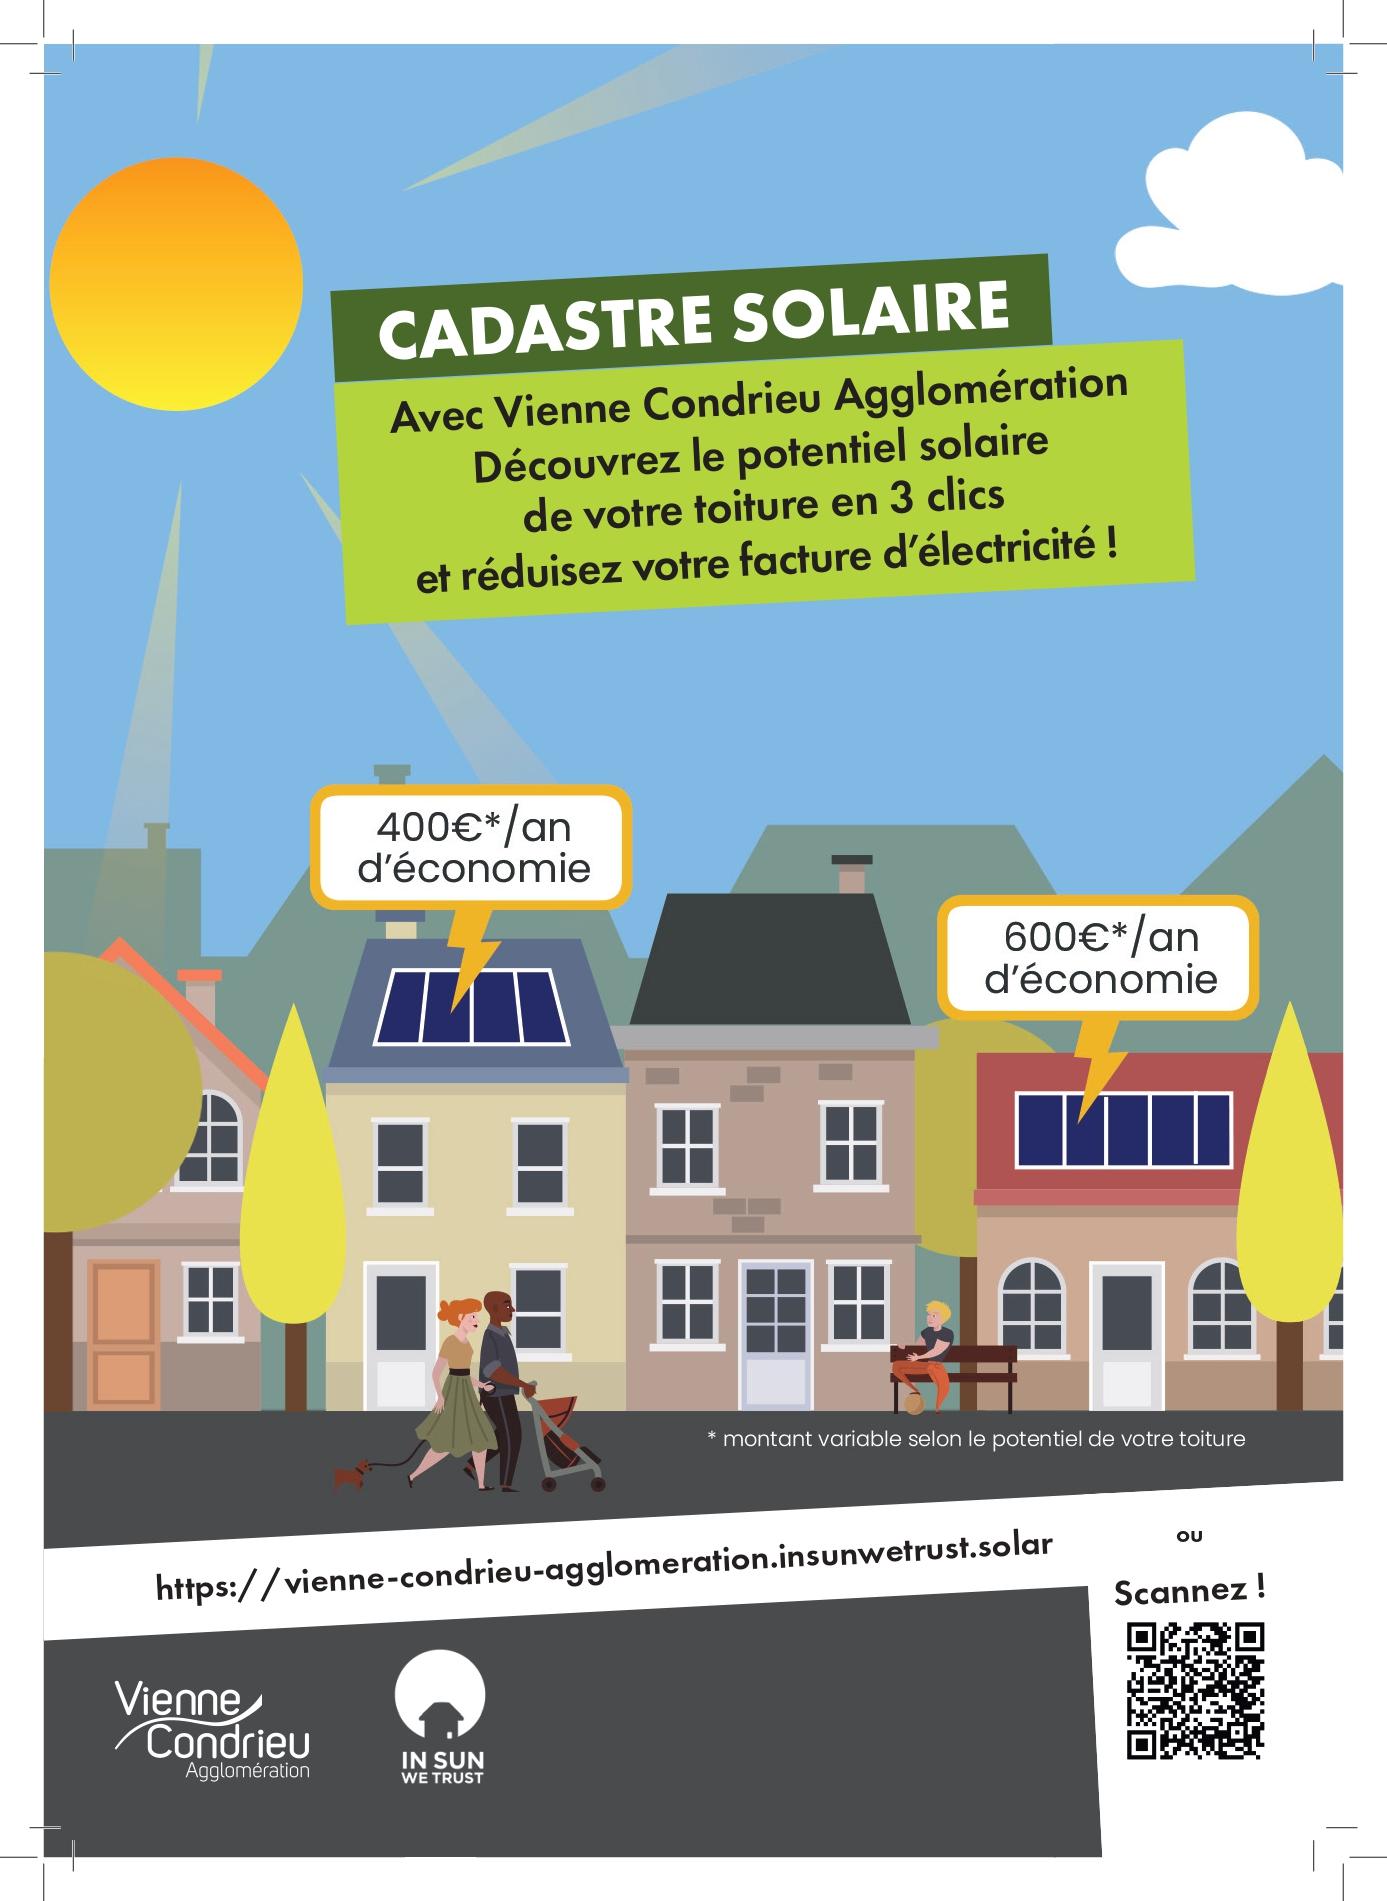 VCA-cadastre solaire_Octobre2020_page-0001.jpg